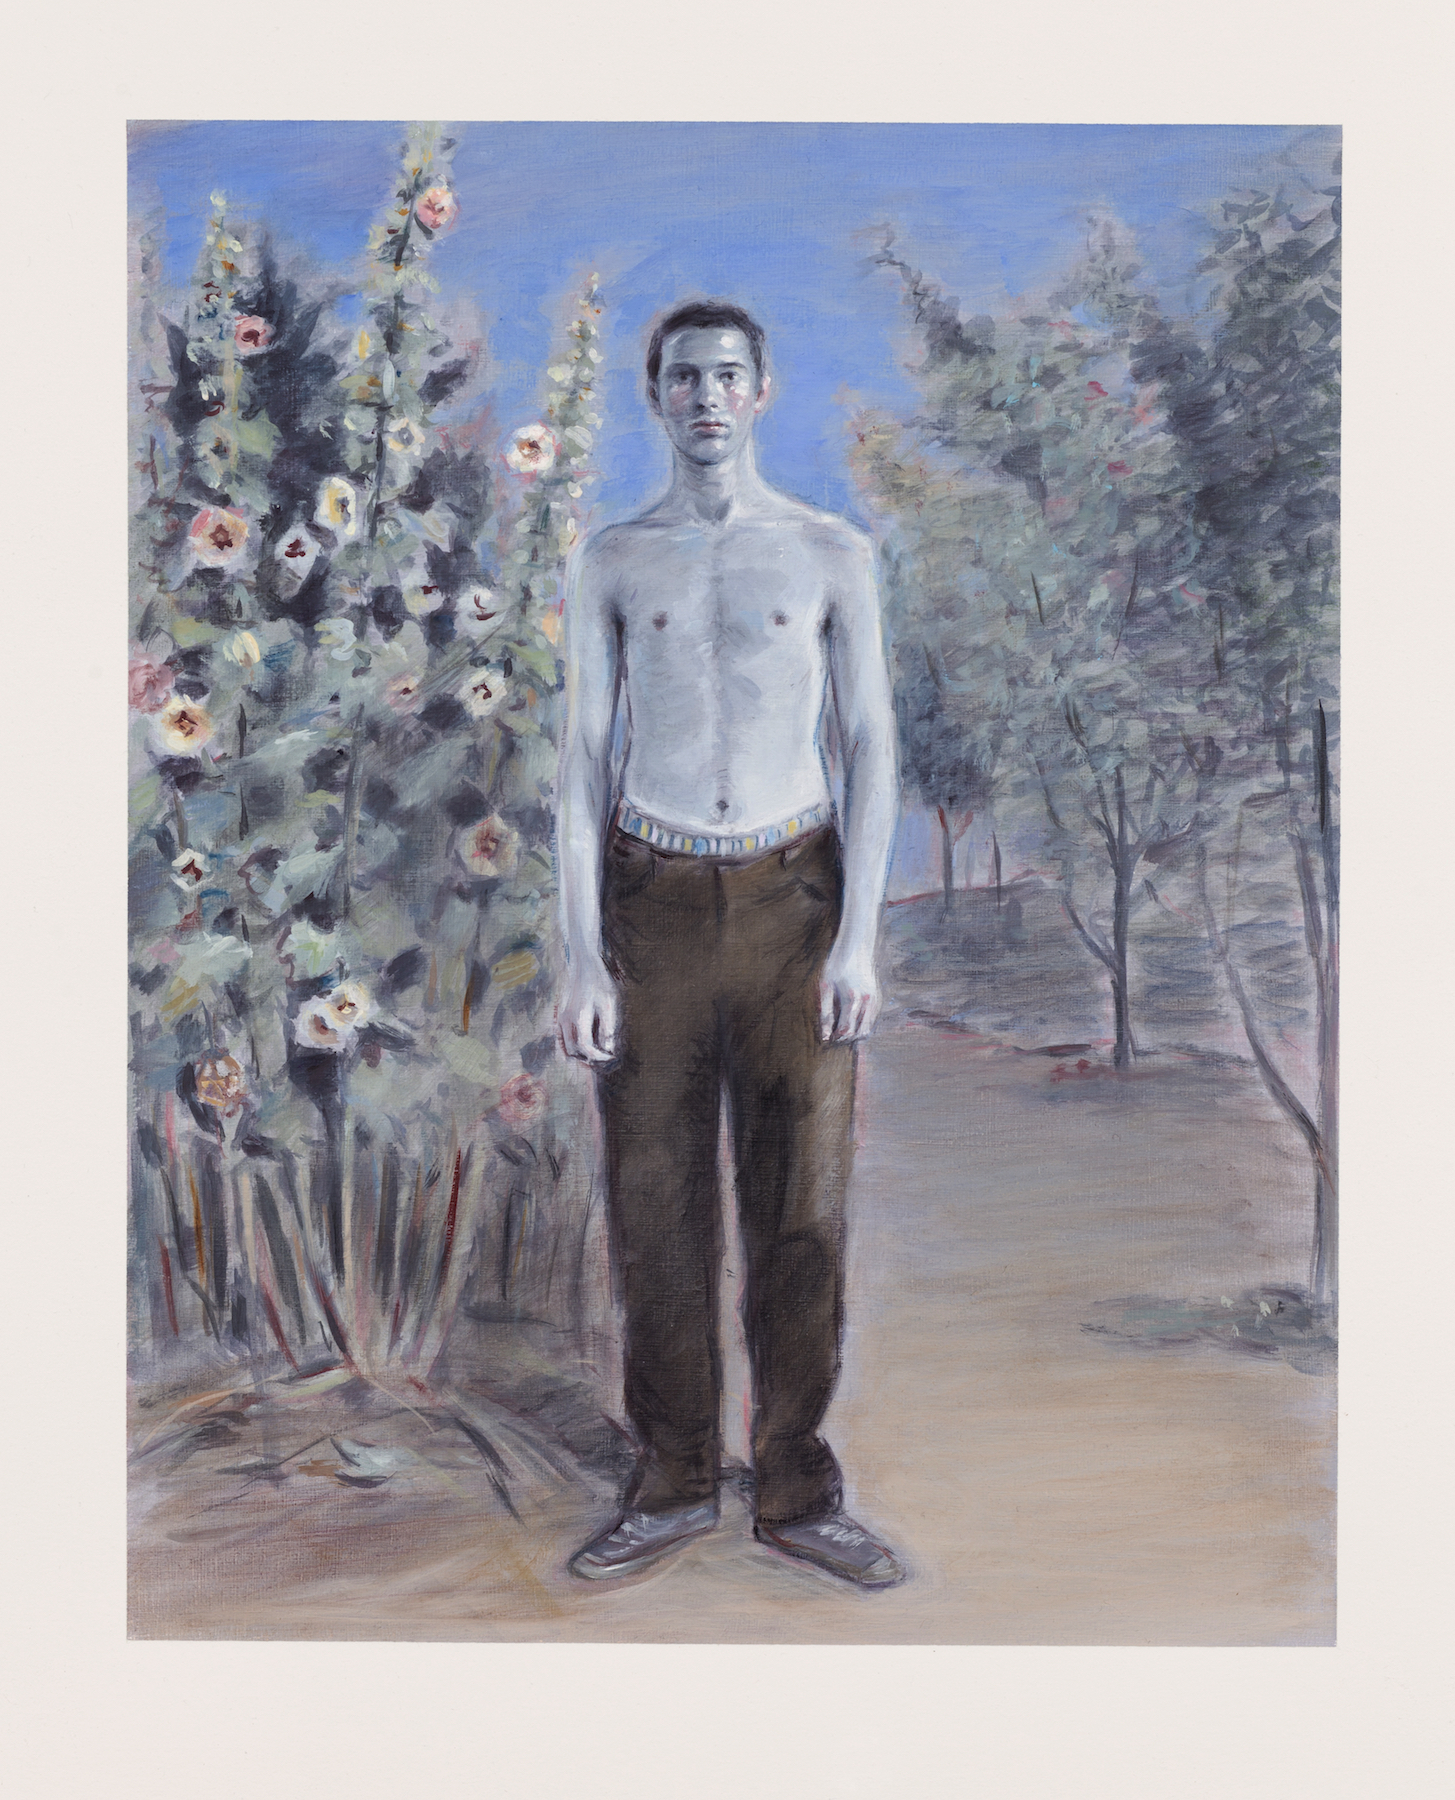 Kris Knight,Purple Blue, Summer 96, 2017, oil on prepared cotton paper, image : 14x11inches